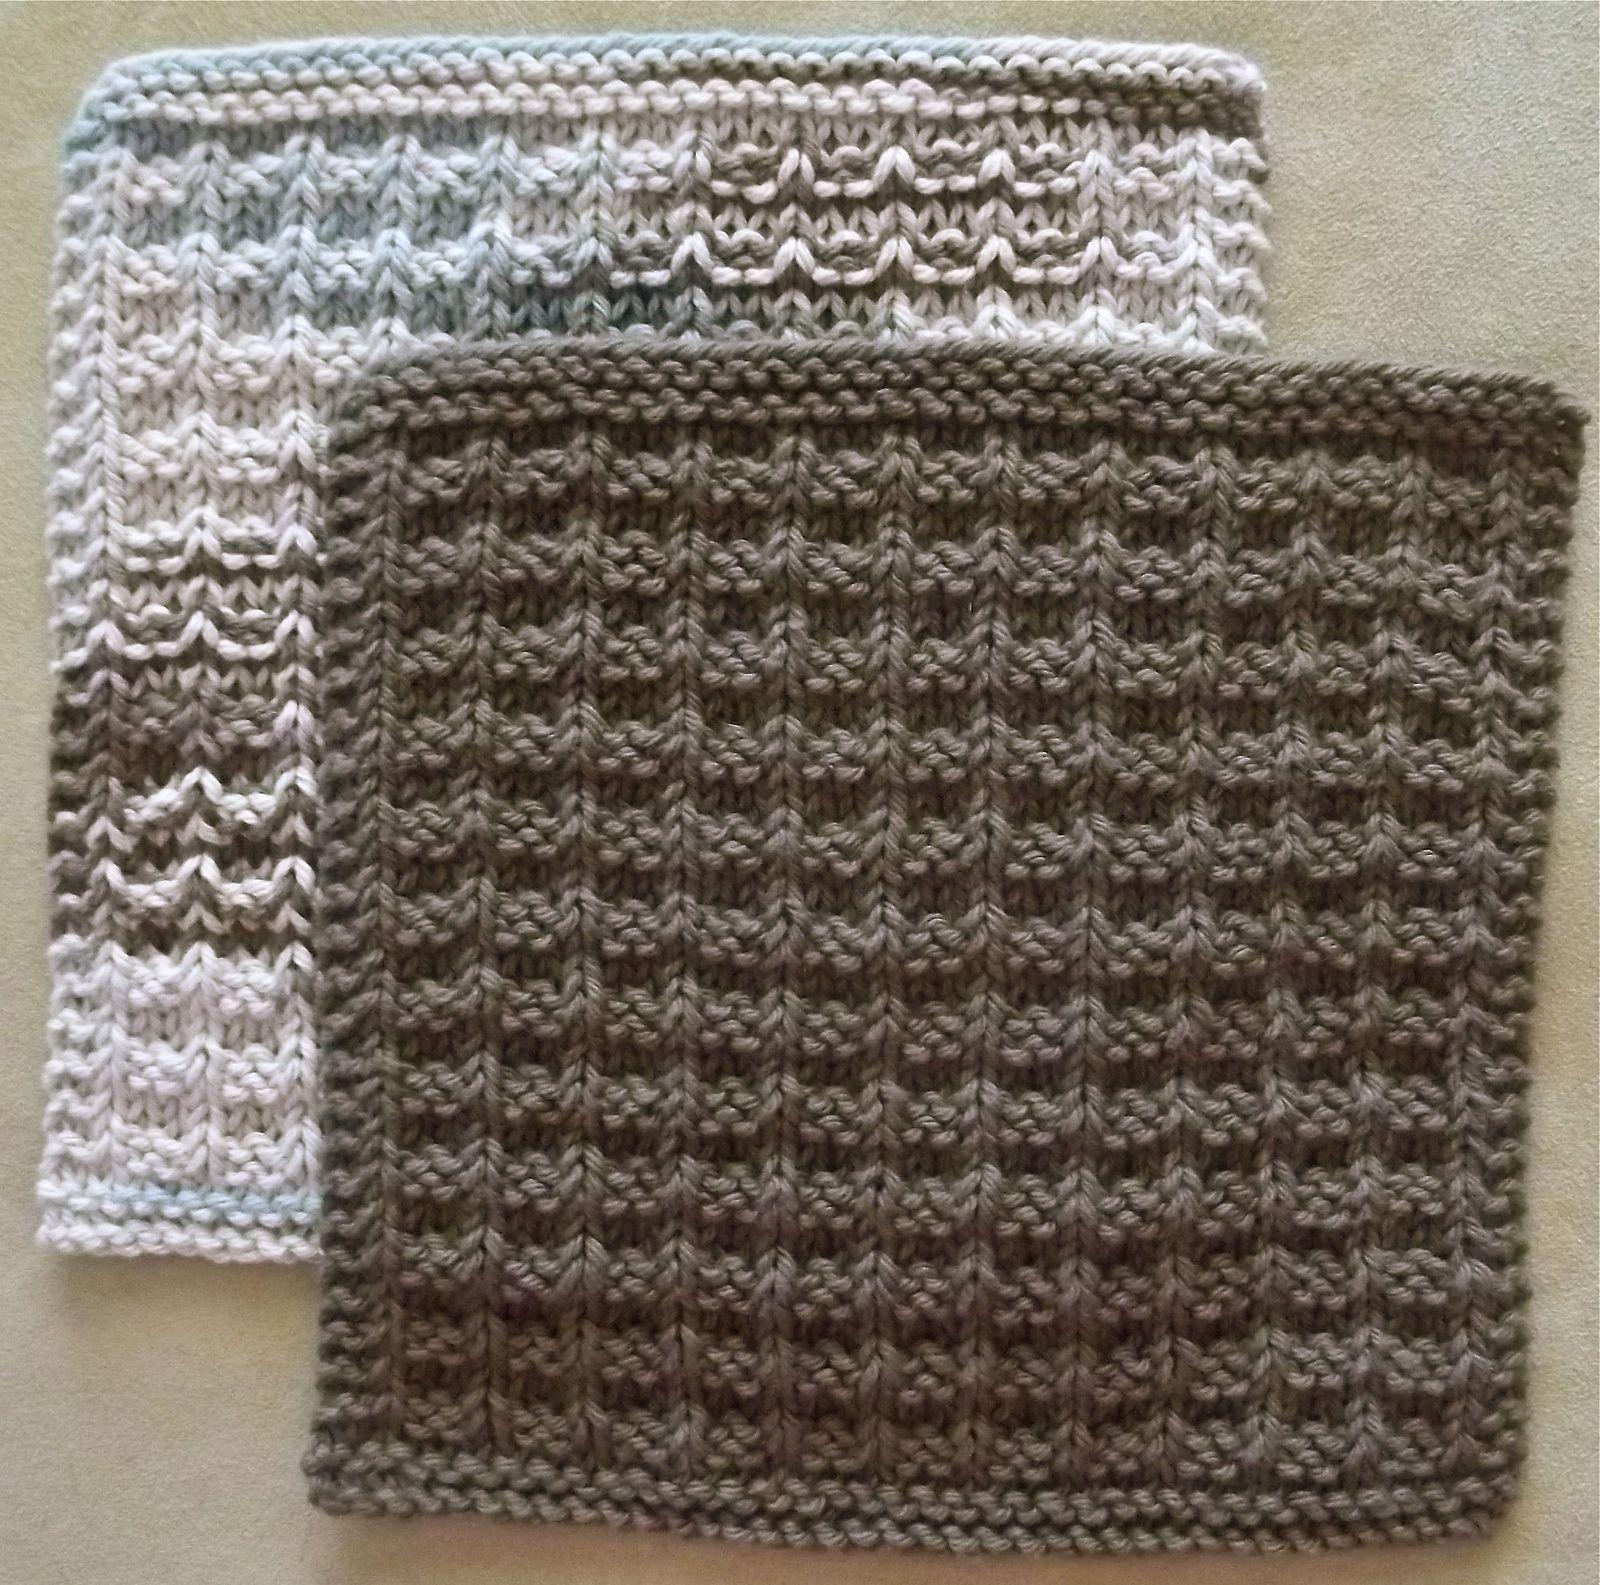 Noni\'s Favorite Kitchen Dishcloth - Free Knitting Pattern - (ravelry ...